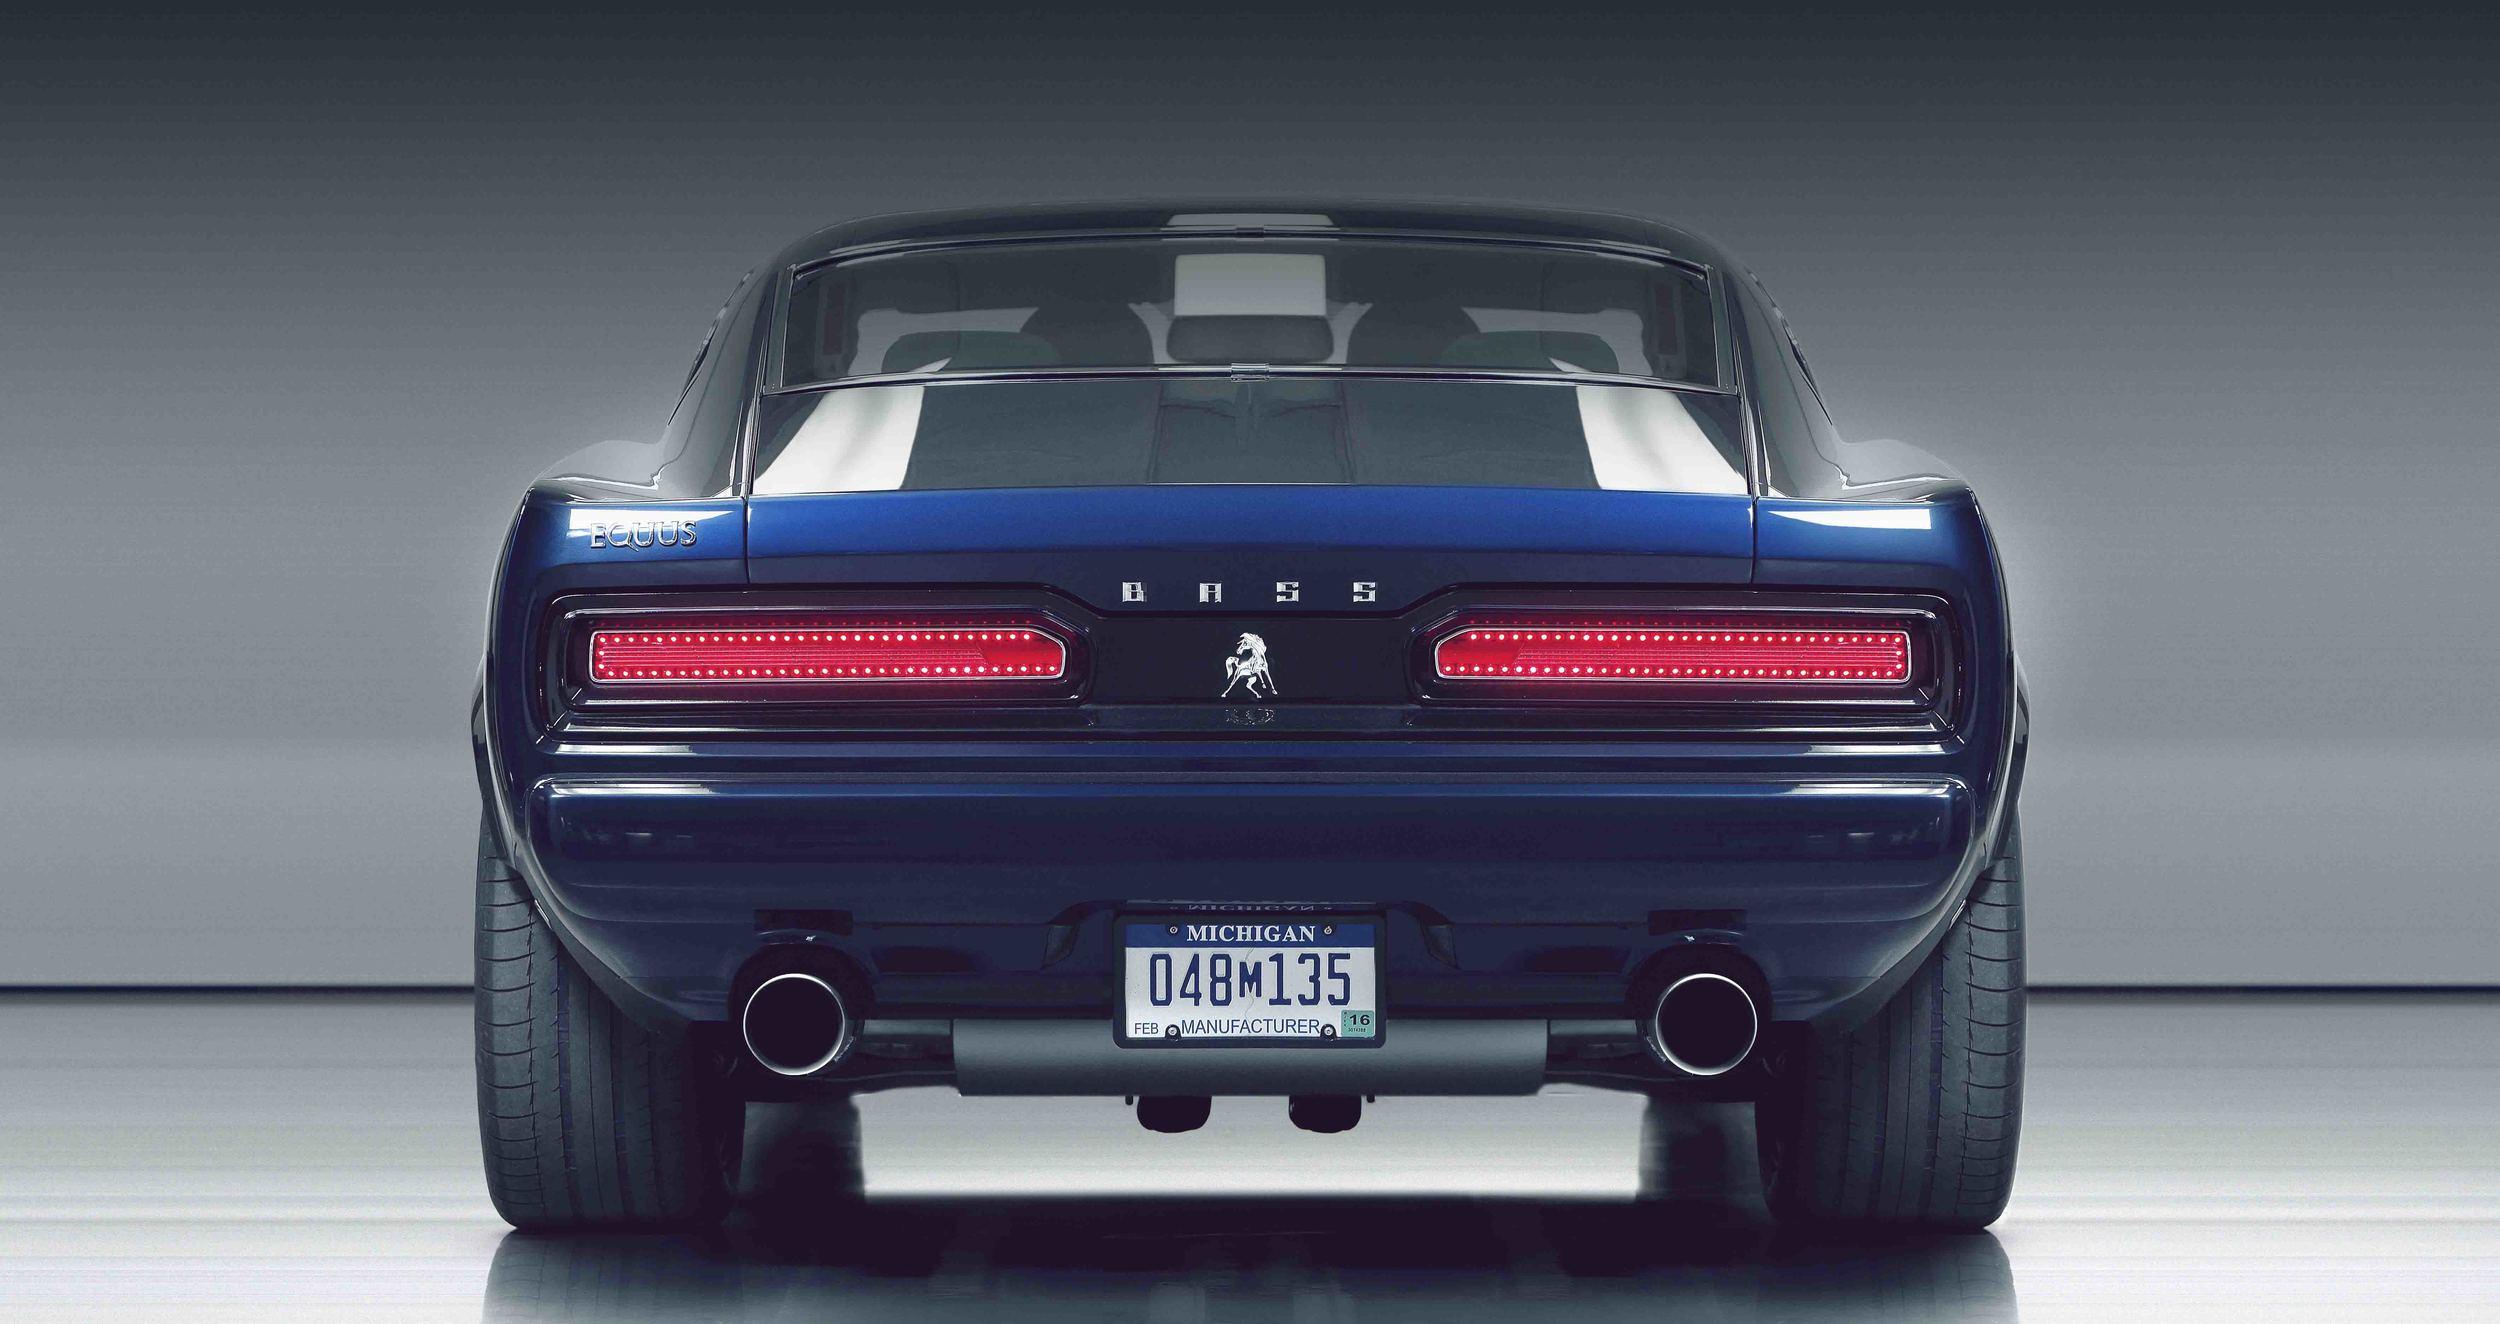 "RED(rear, blue)EQUUS PRESS 8 img alt=""equus bass 770"".jpg"